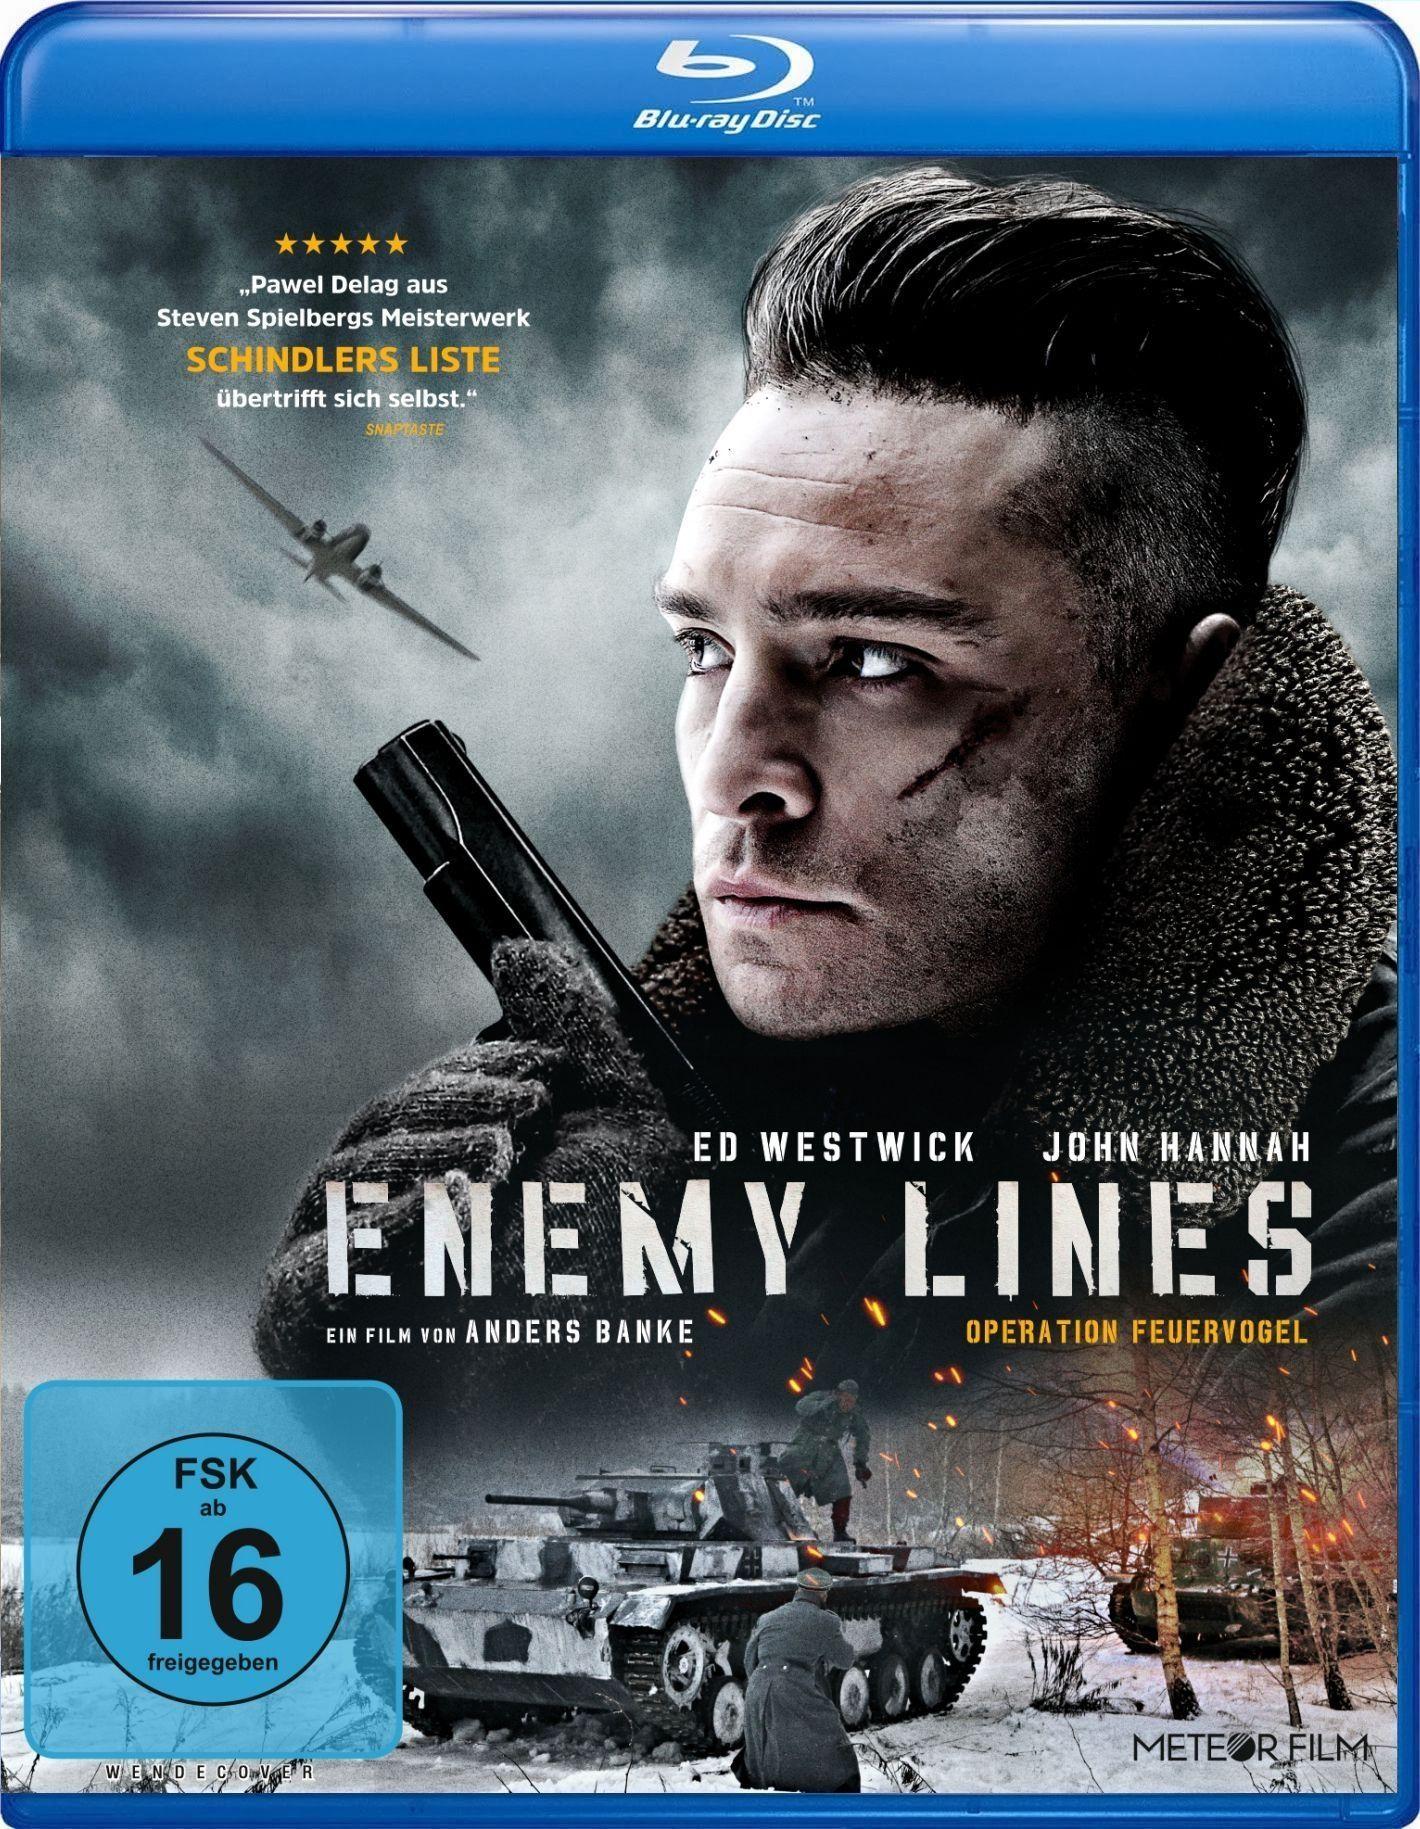 Enemy Lines - Codename Feuervogel (BLURAY)